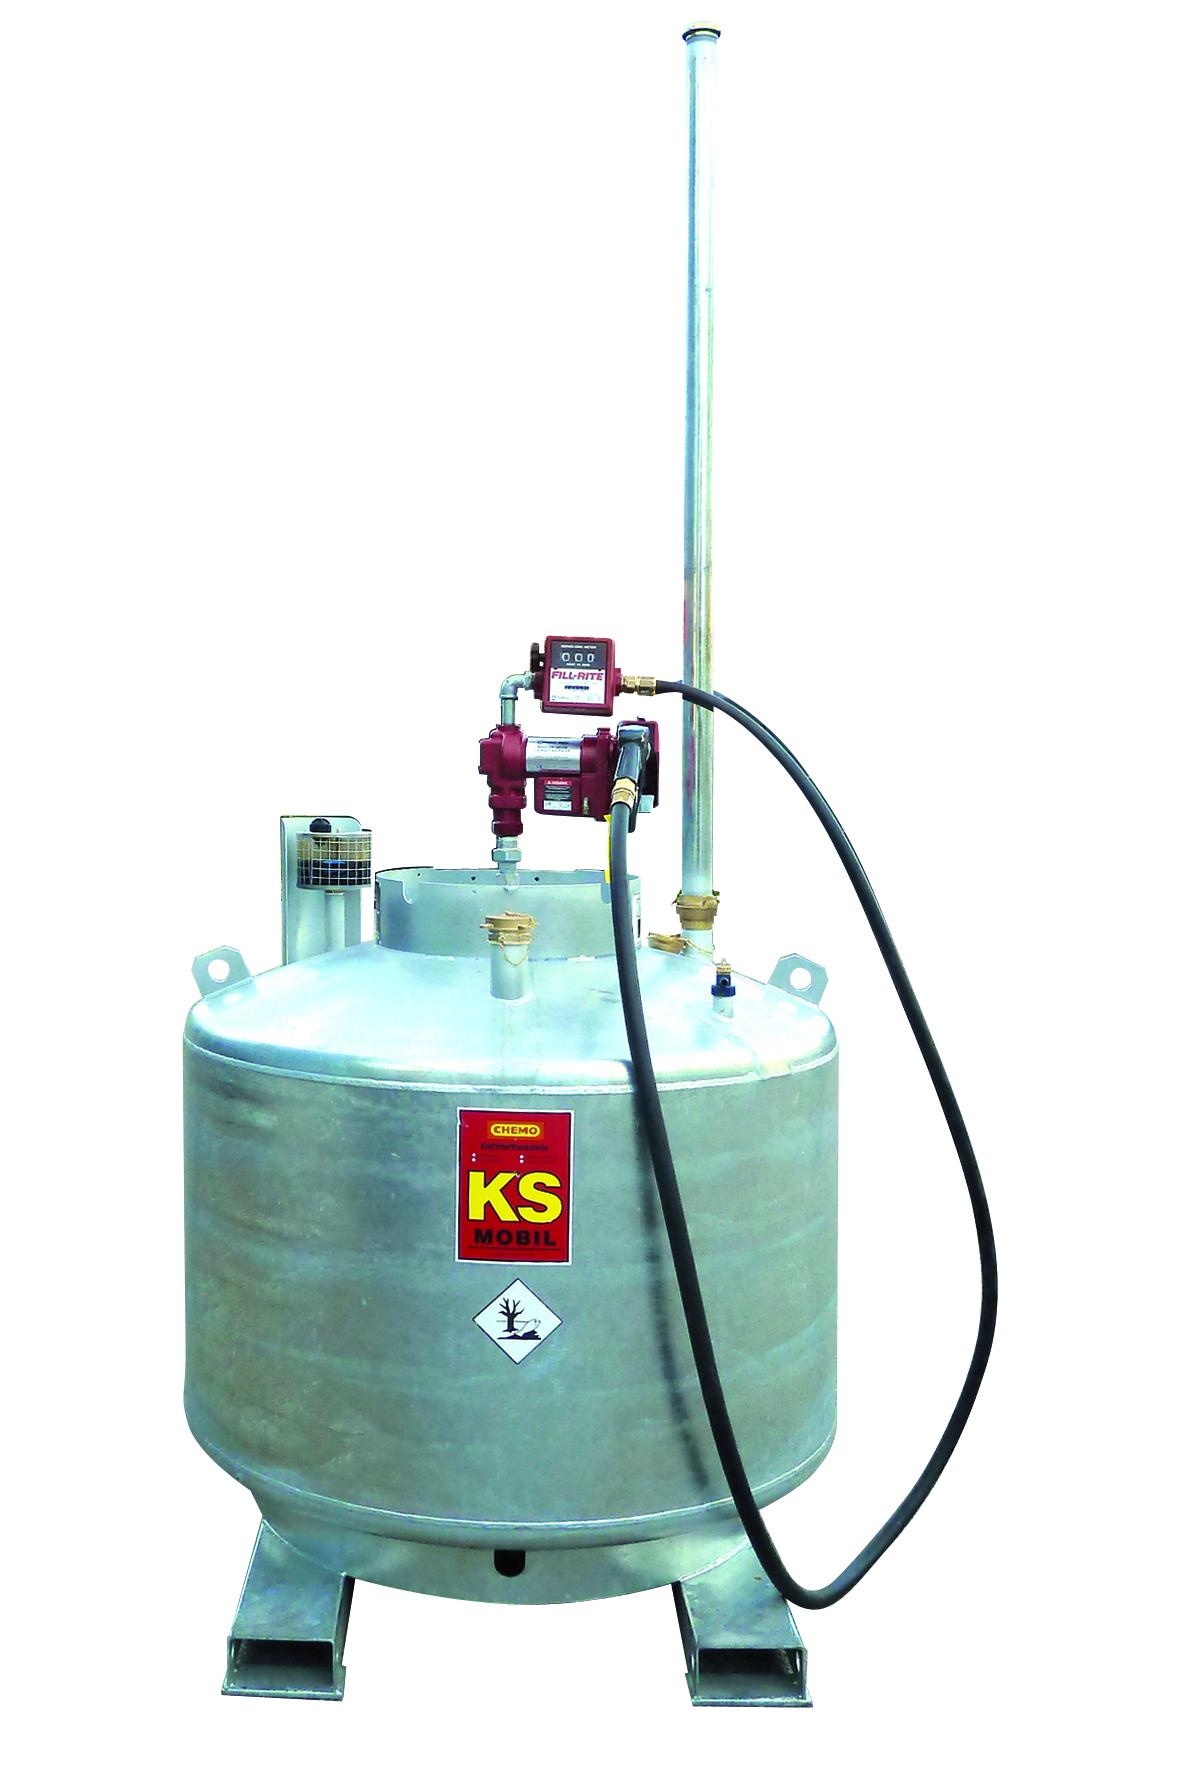 Cuve essence avec pompe Atex